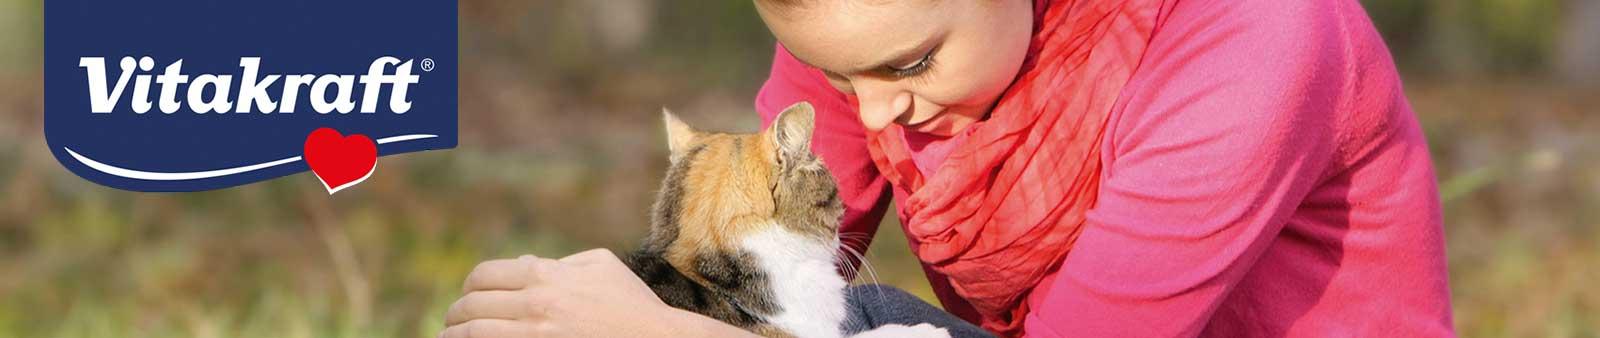 Vitakraft Katzenleckerlis